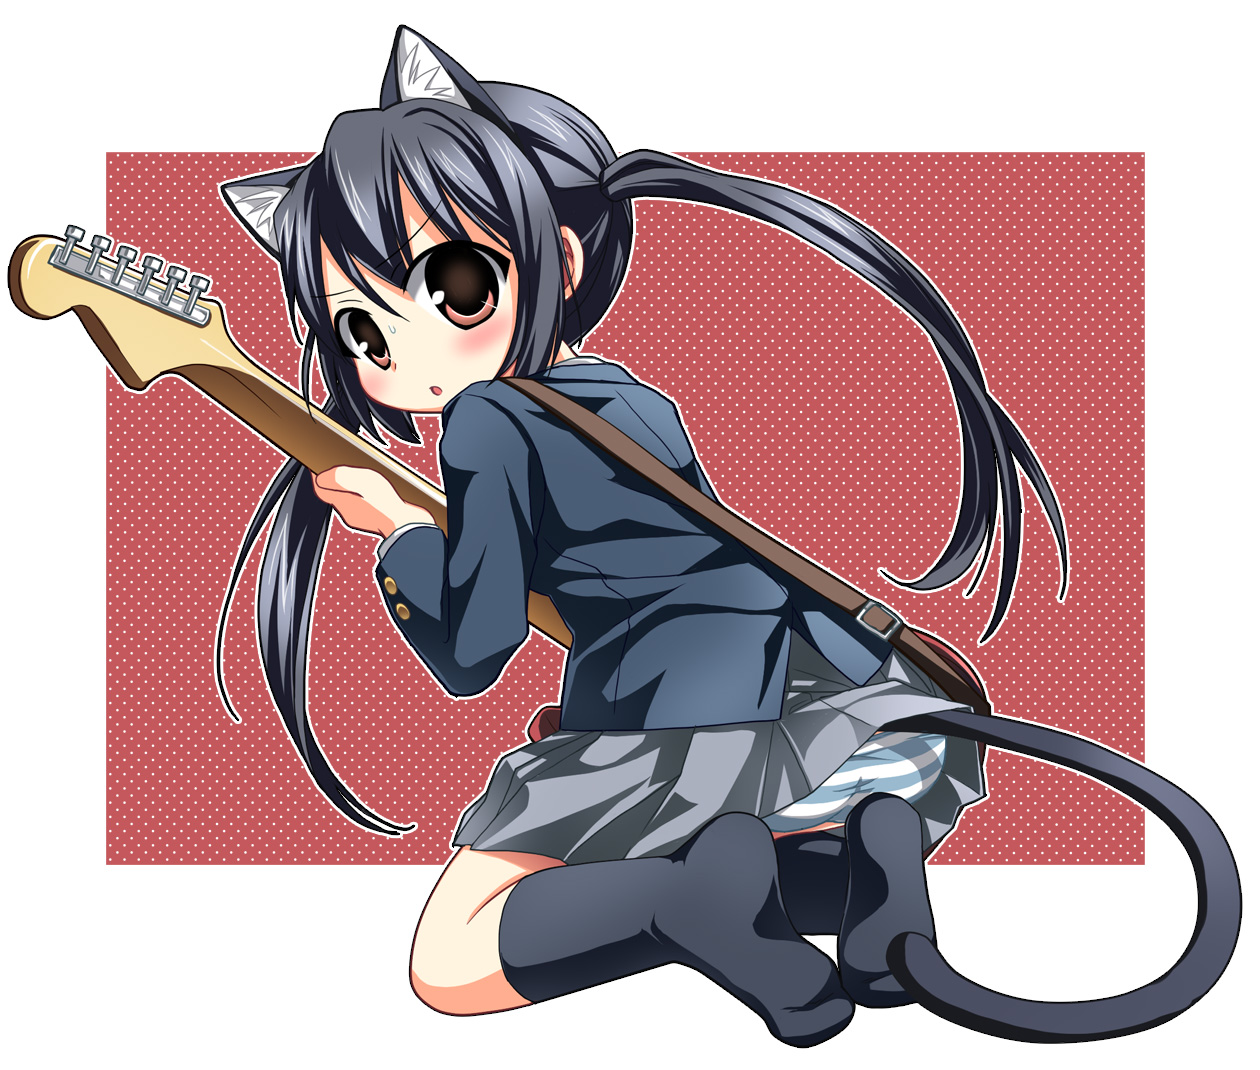 animal animal ears blush boots bra cat catgirl long hair